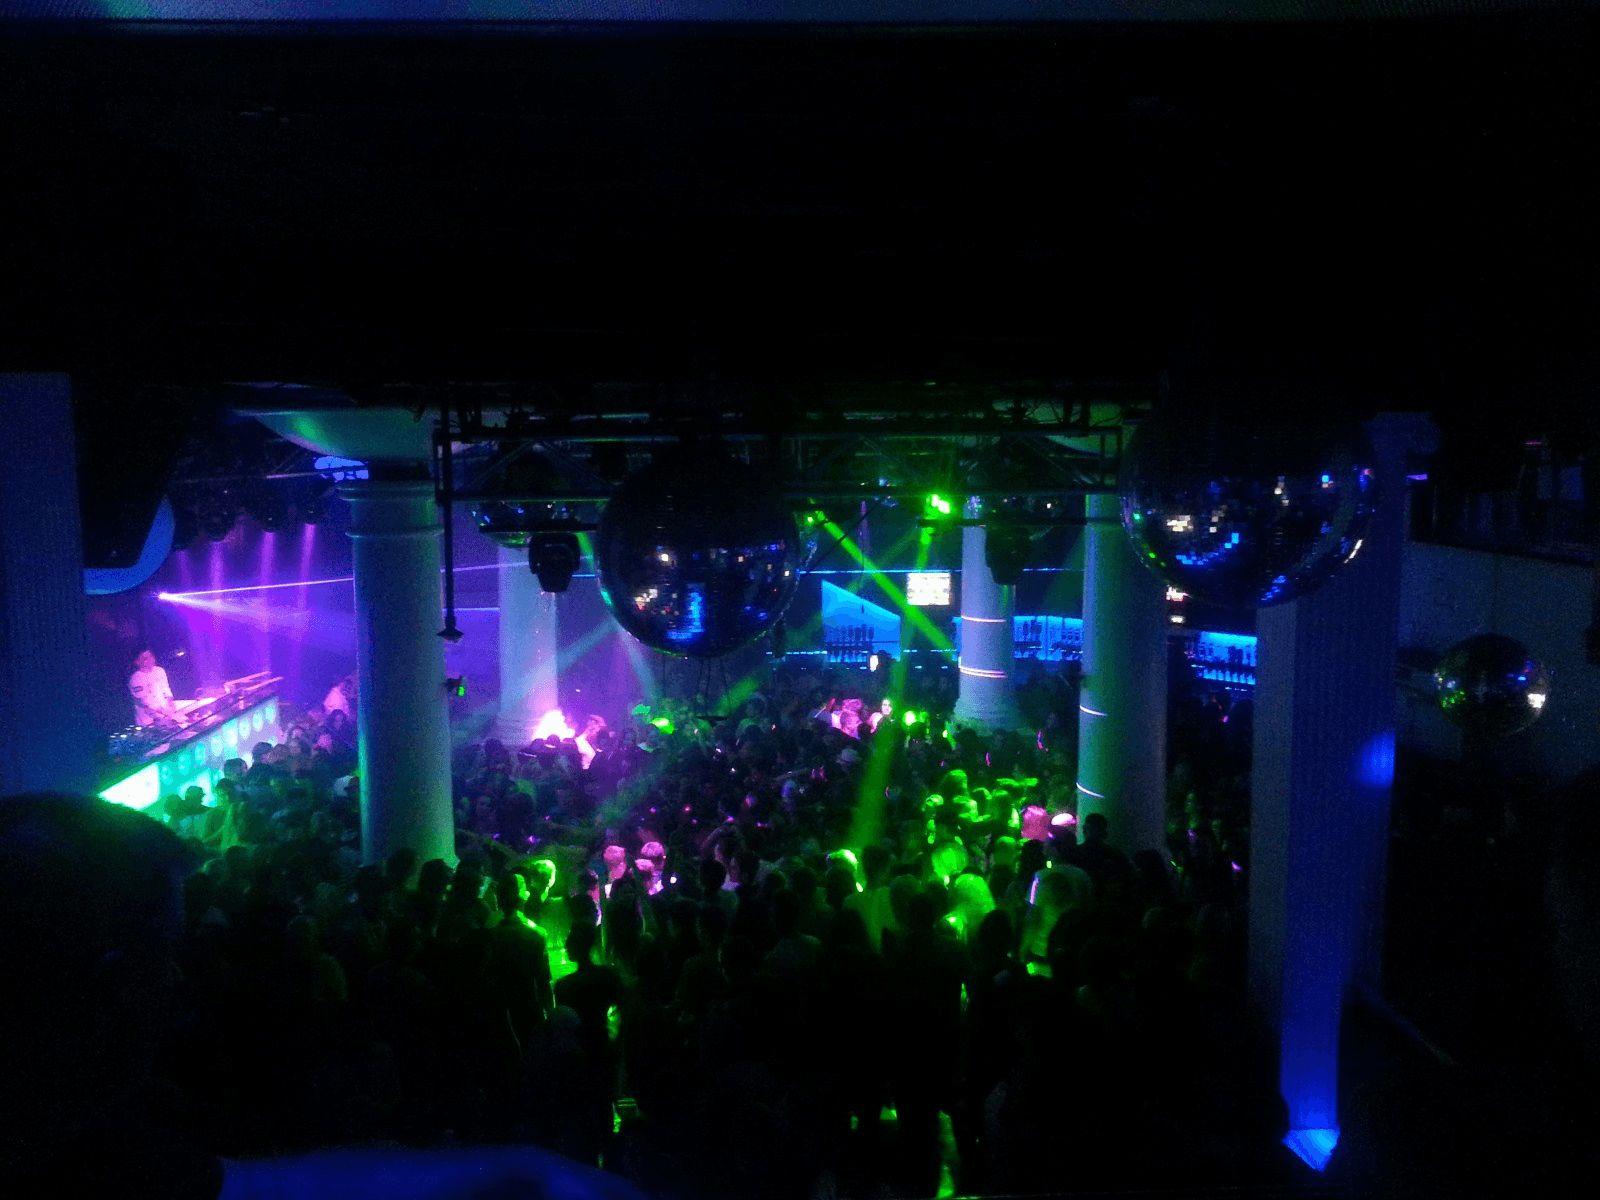 Španjolska i Provansa: Lloret de Mar: najbolji klubovi Tropisc i Moby's